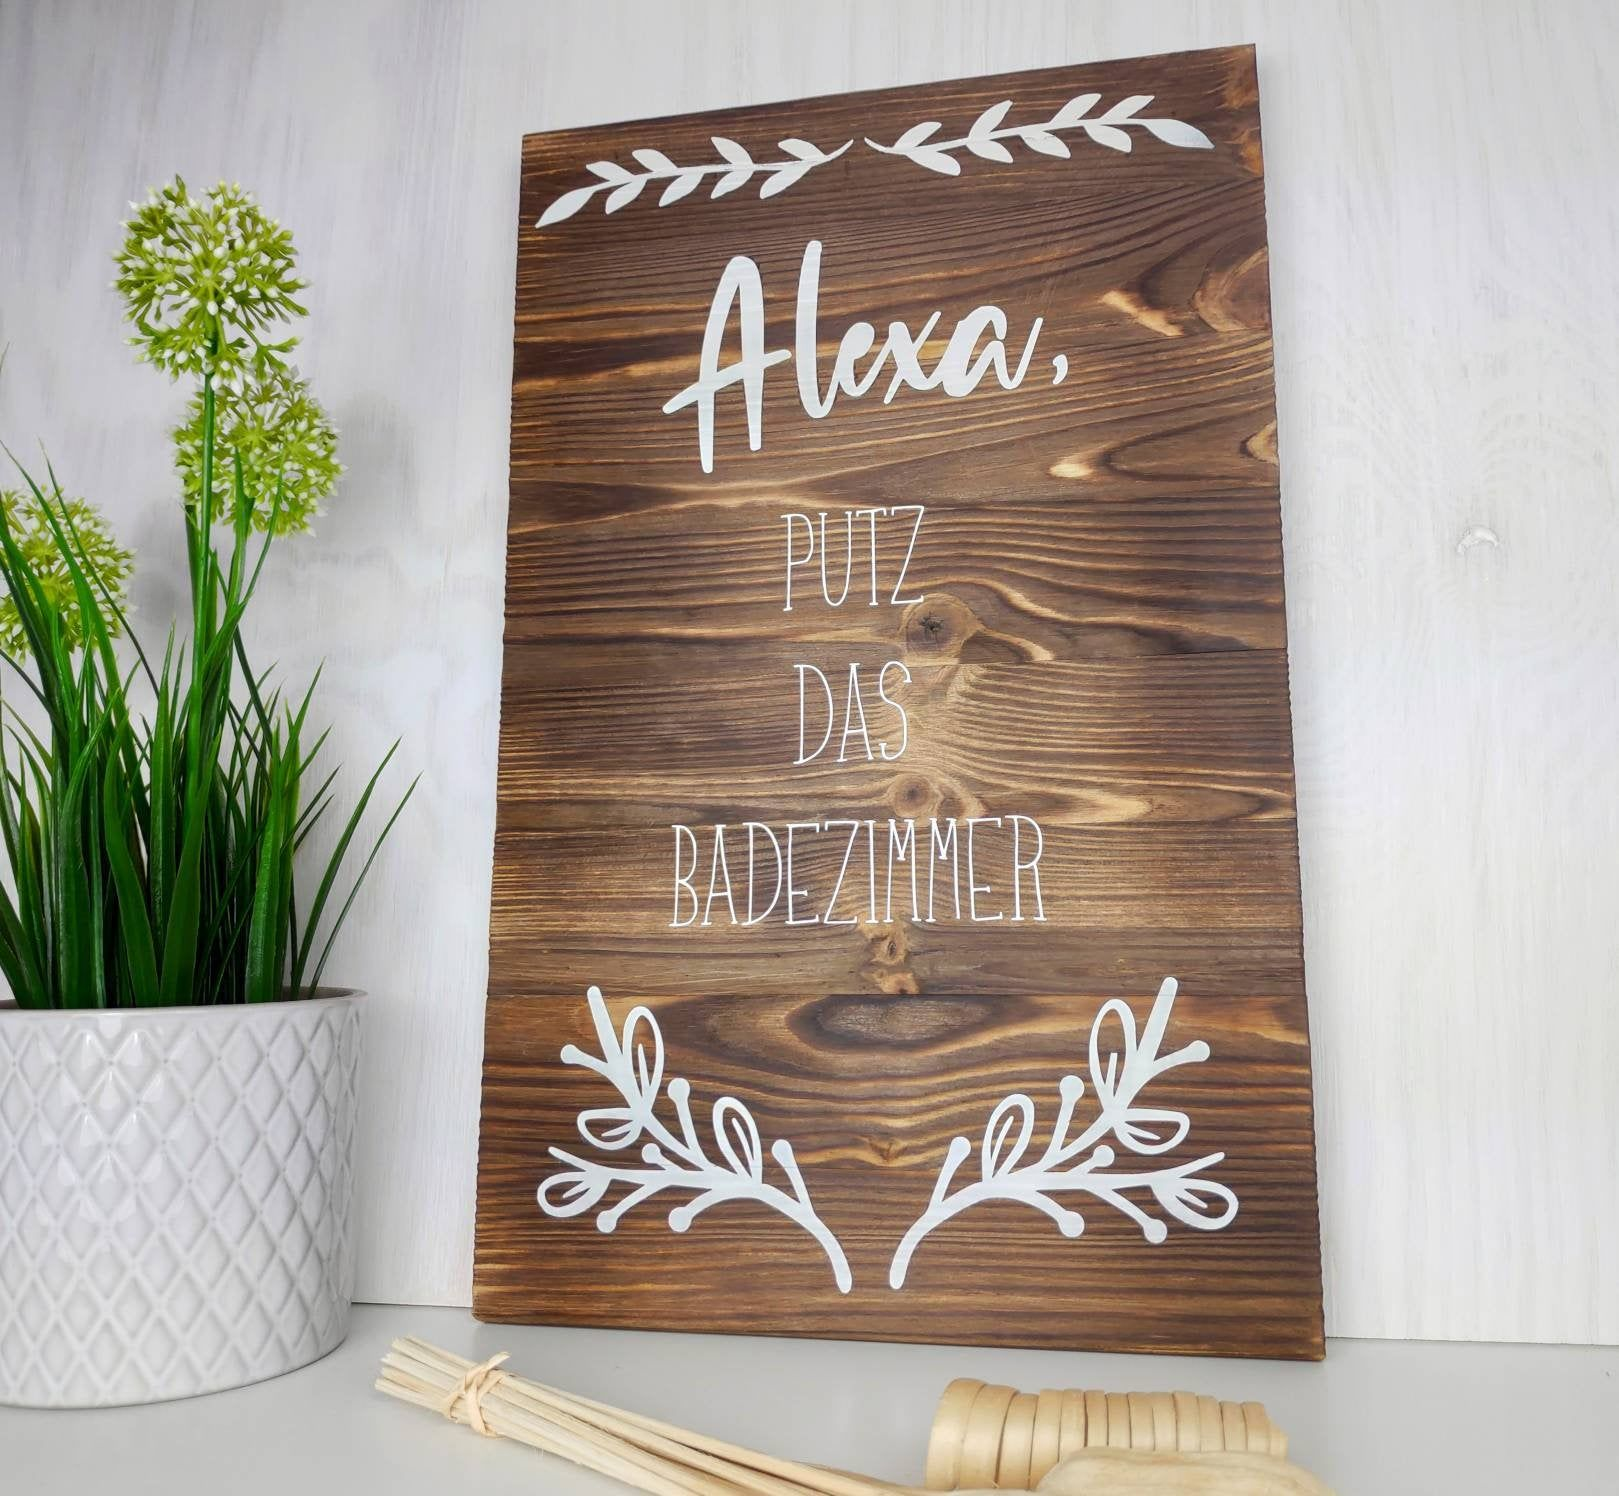 Badezimmer Wanddekoration Alexa Putz Das Badezimmer Farmhaus Holzschild In 2020 Decor Novelty Sign Alexa